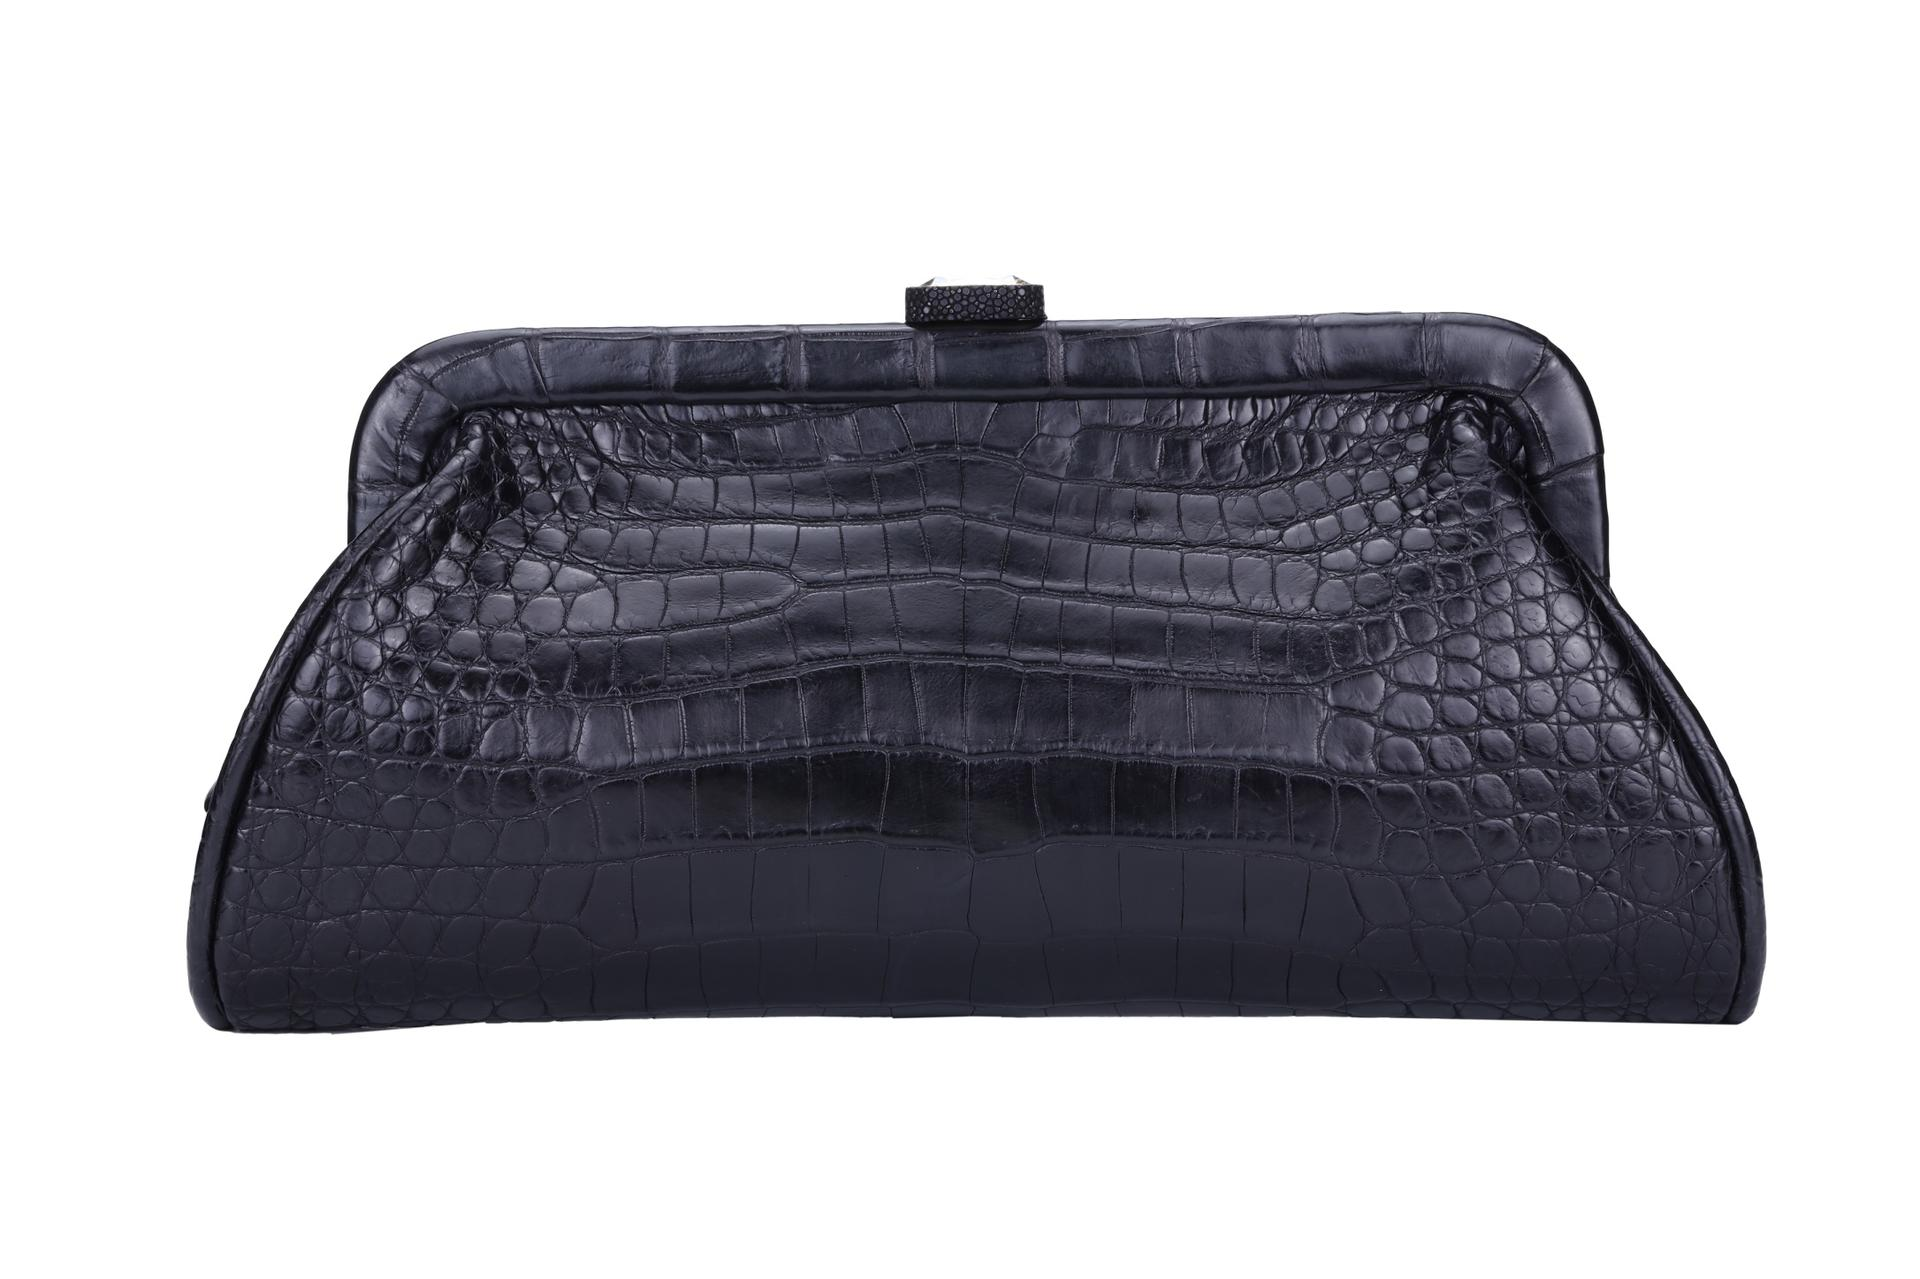 Cosmetic bag leather make top closure